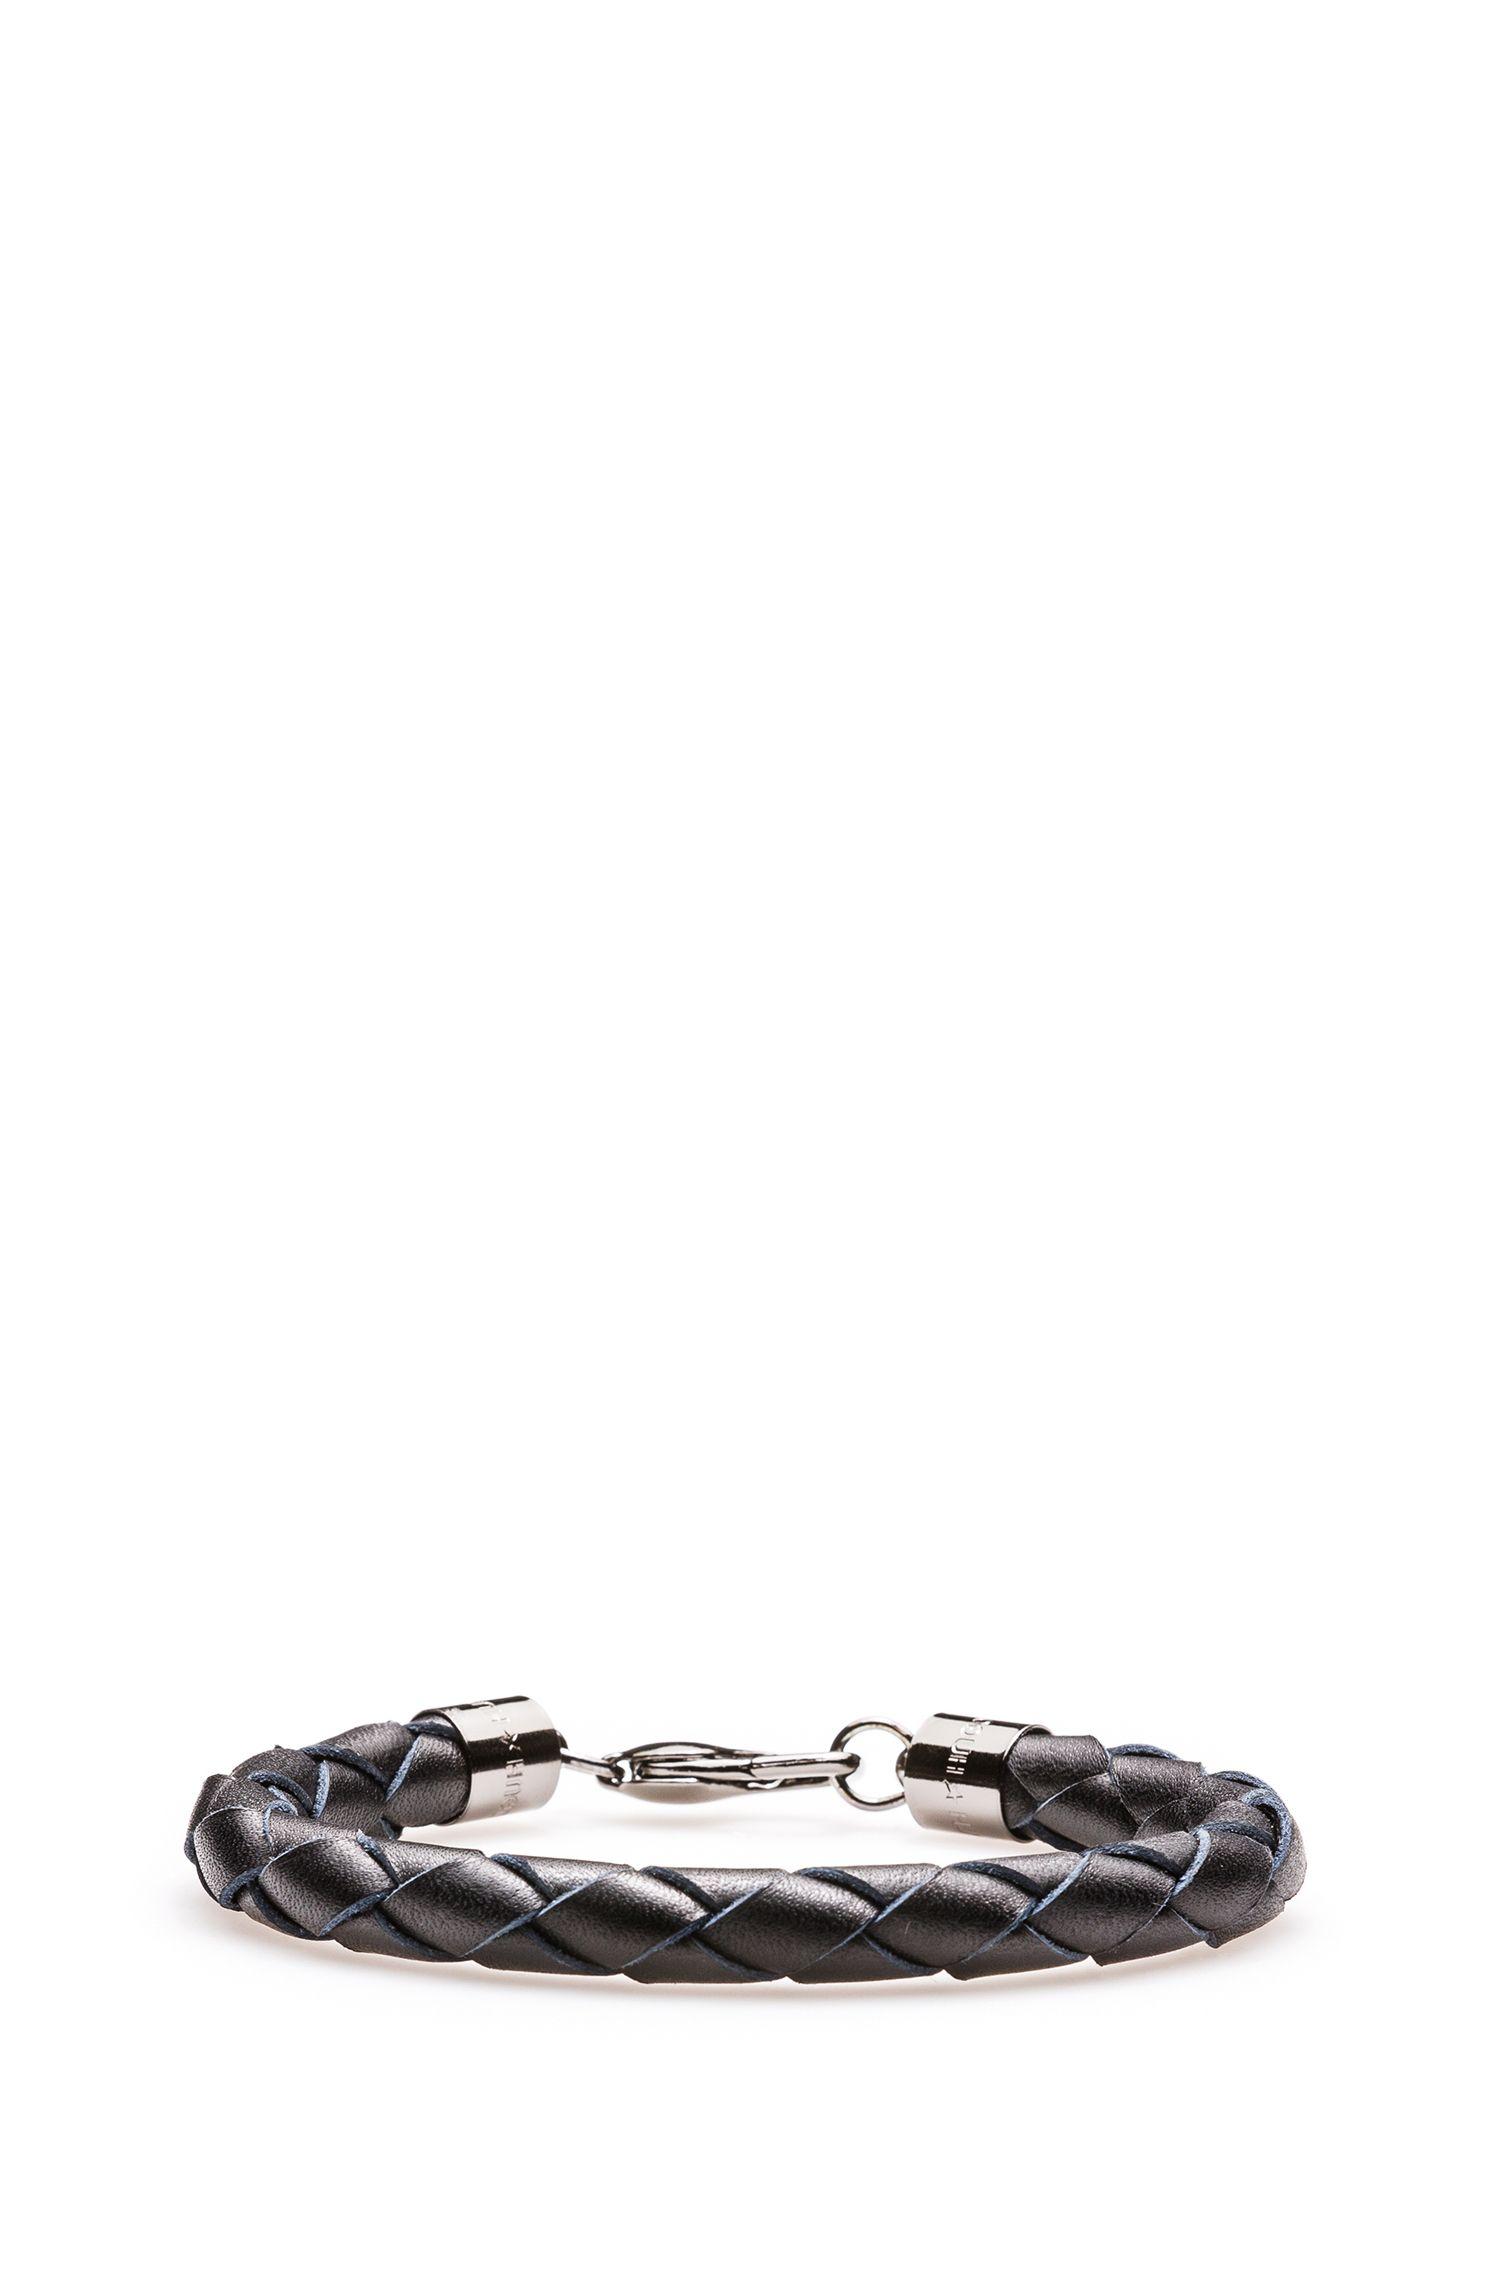 Woven Leather Bracelet | E-Cuir